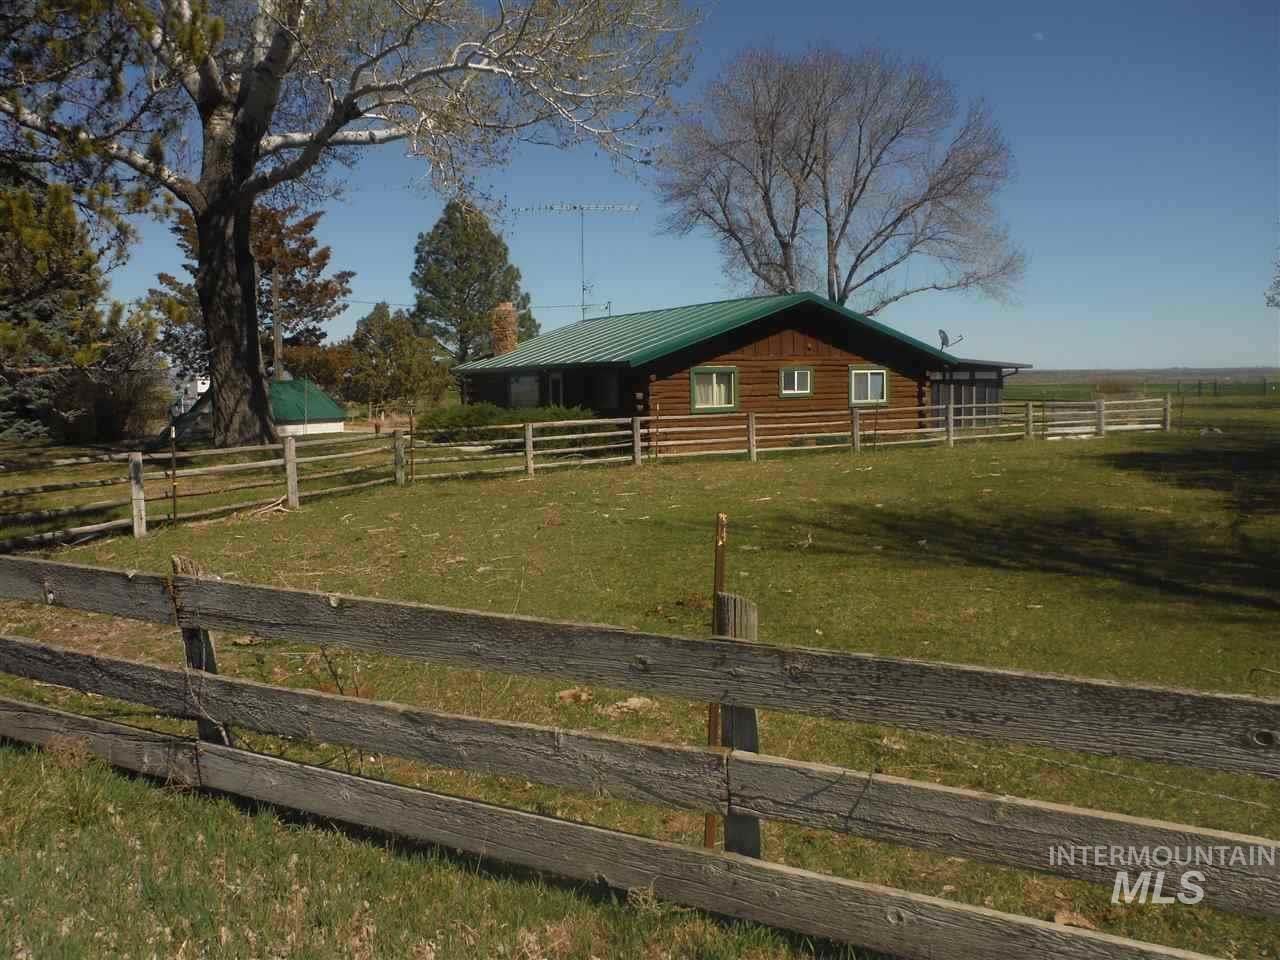 Single Family Home for Sale at 1822 S 750 E 1822 S 750 E Bliss, Idaho 83314